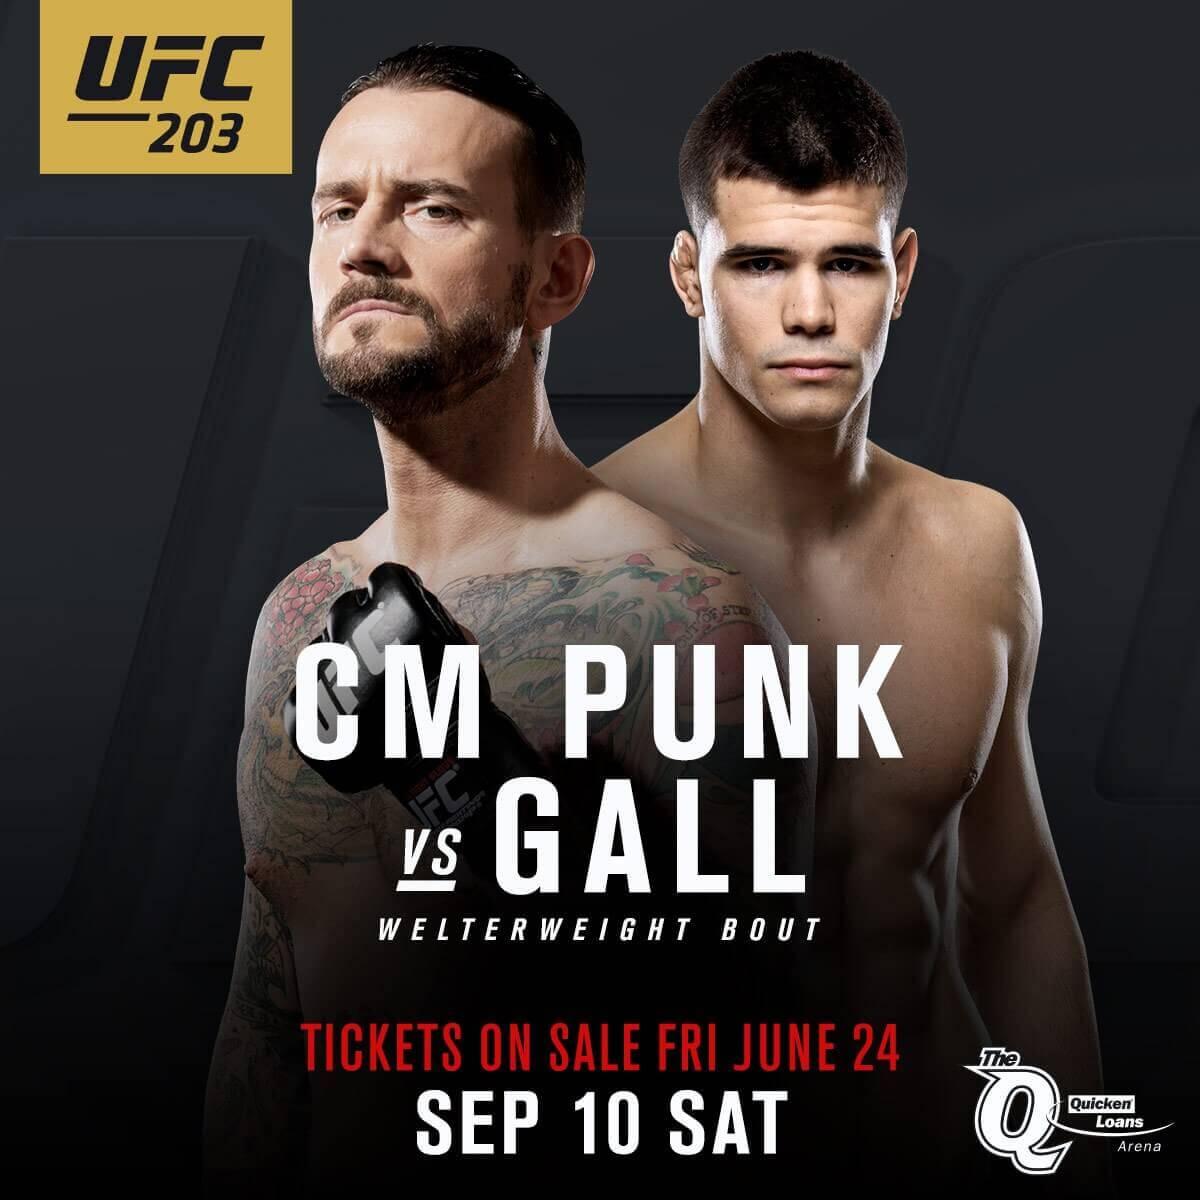 UFC 203 Odds Punk vs Gall